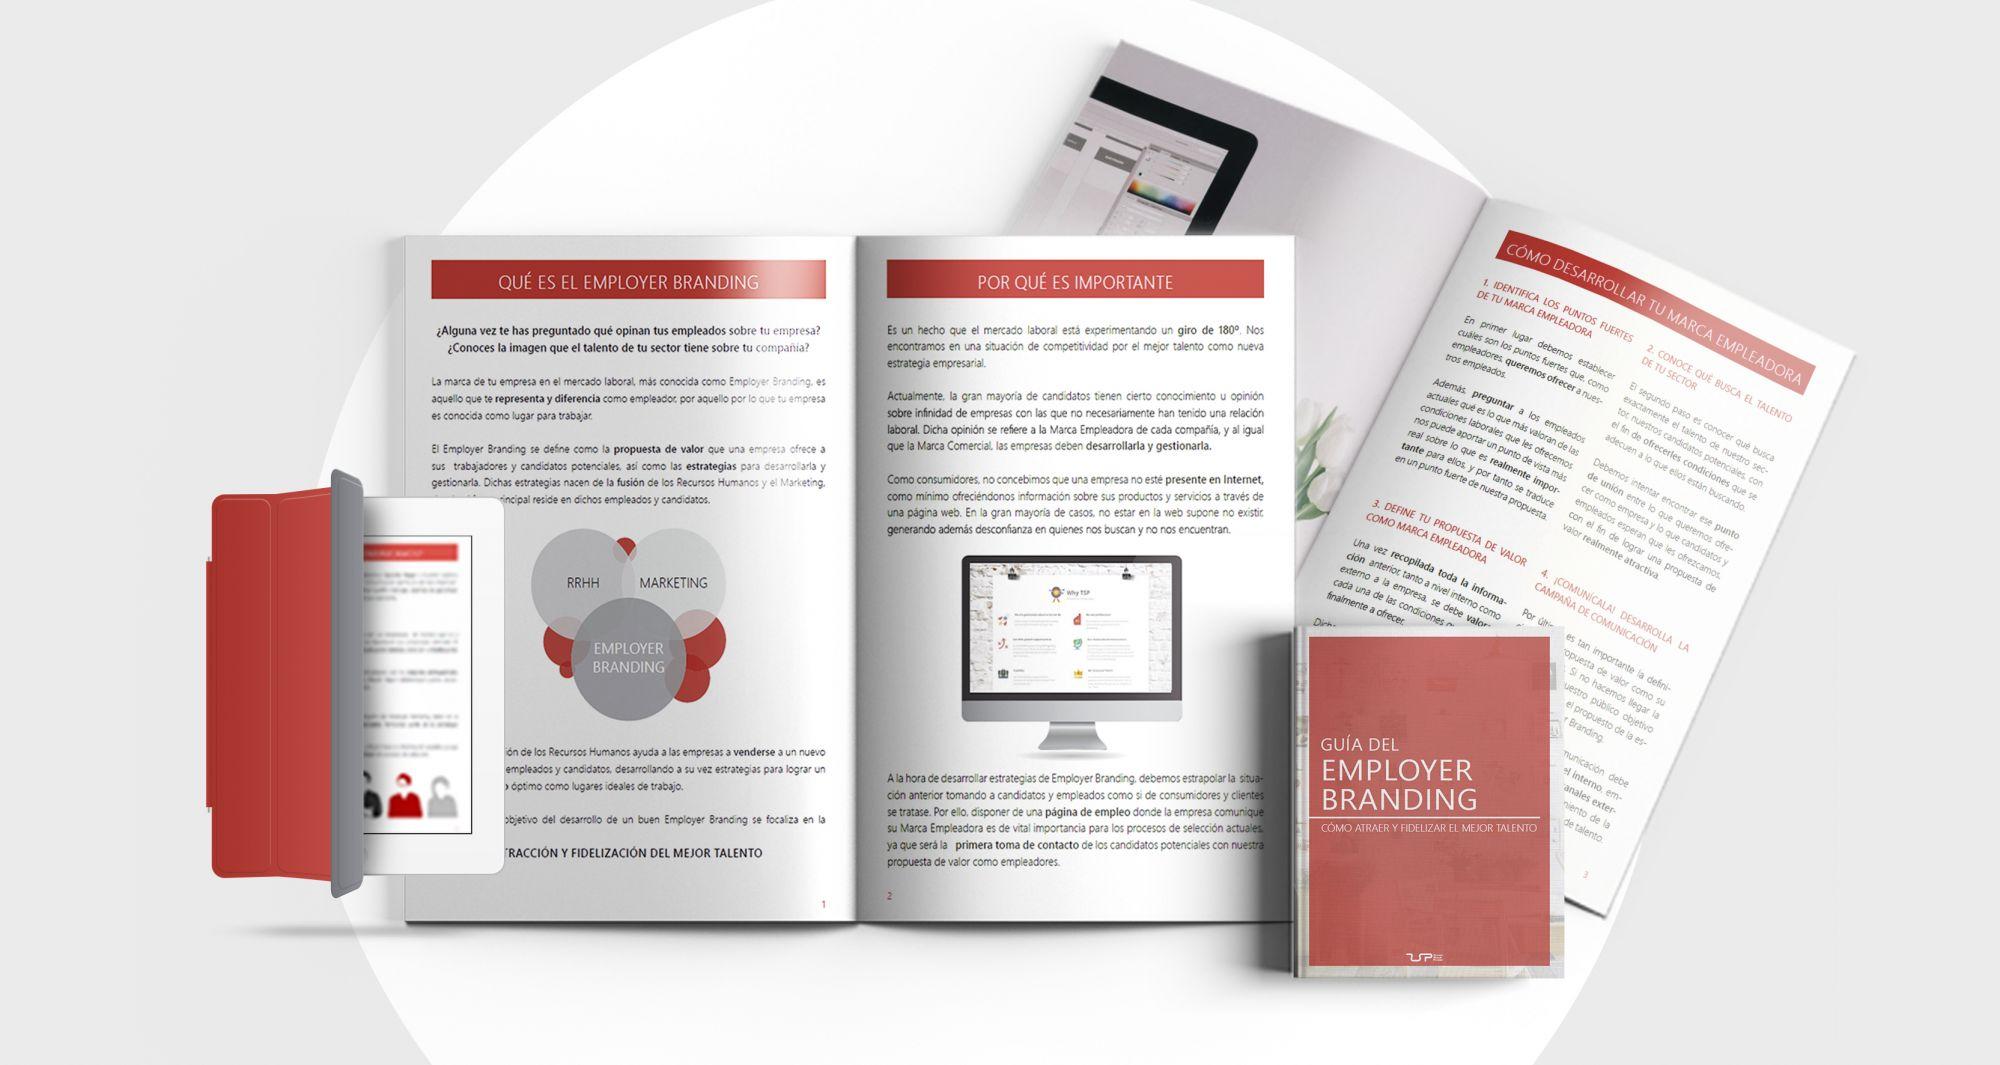 Guía del Employer Branding